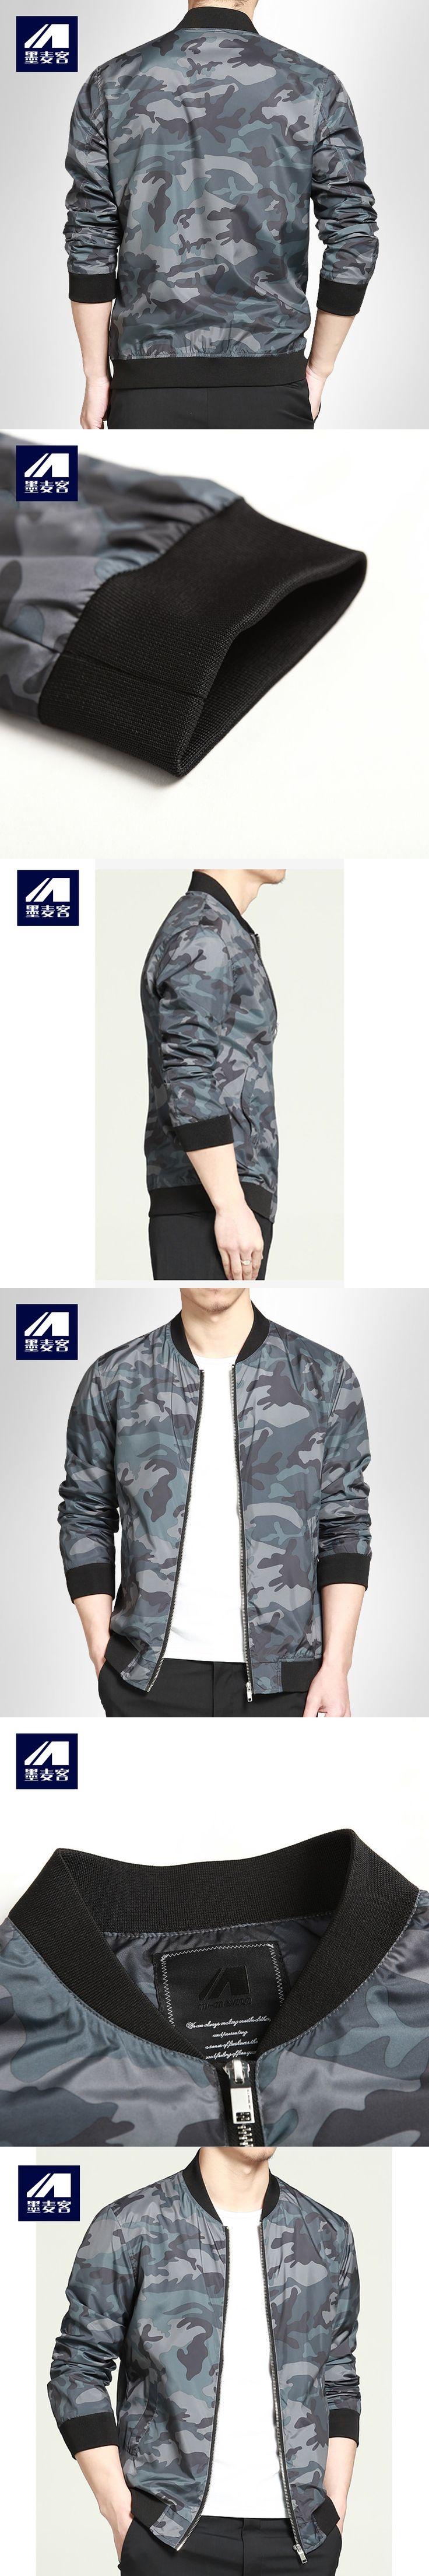 Mmaicco Men Camouflage Pilot Jacket Men Army Bomber Jacket Men Windbreaker Military Overcoat Men Skin Ultralight Waterproof Coat